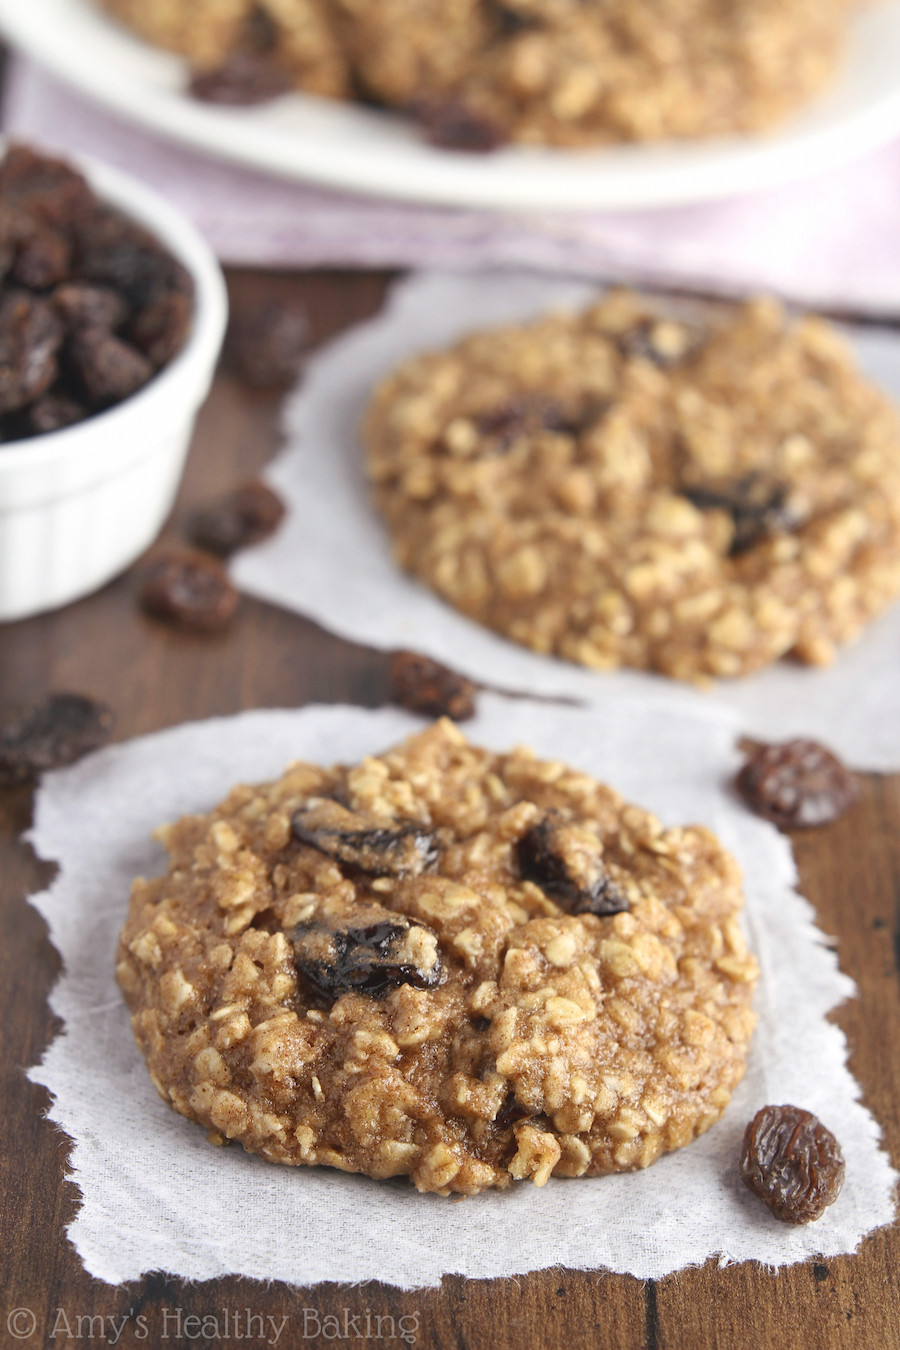 Oatmeal Raisin Cookies Recipe Healthy  heart healthy oatmeal raisin cookies